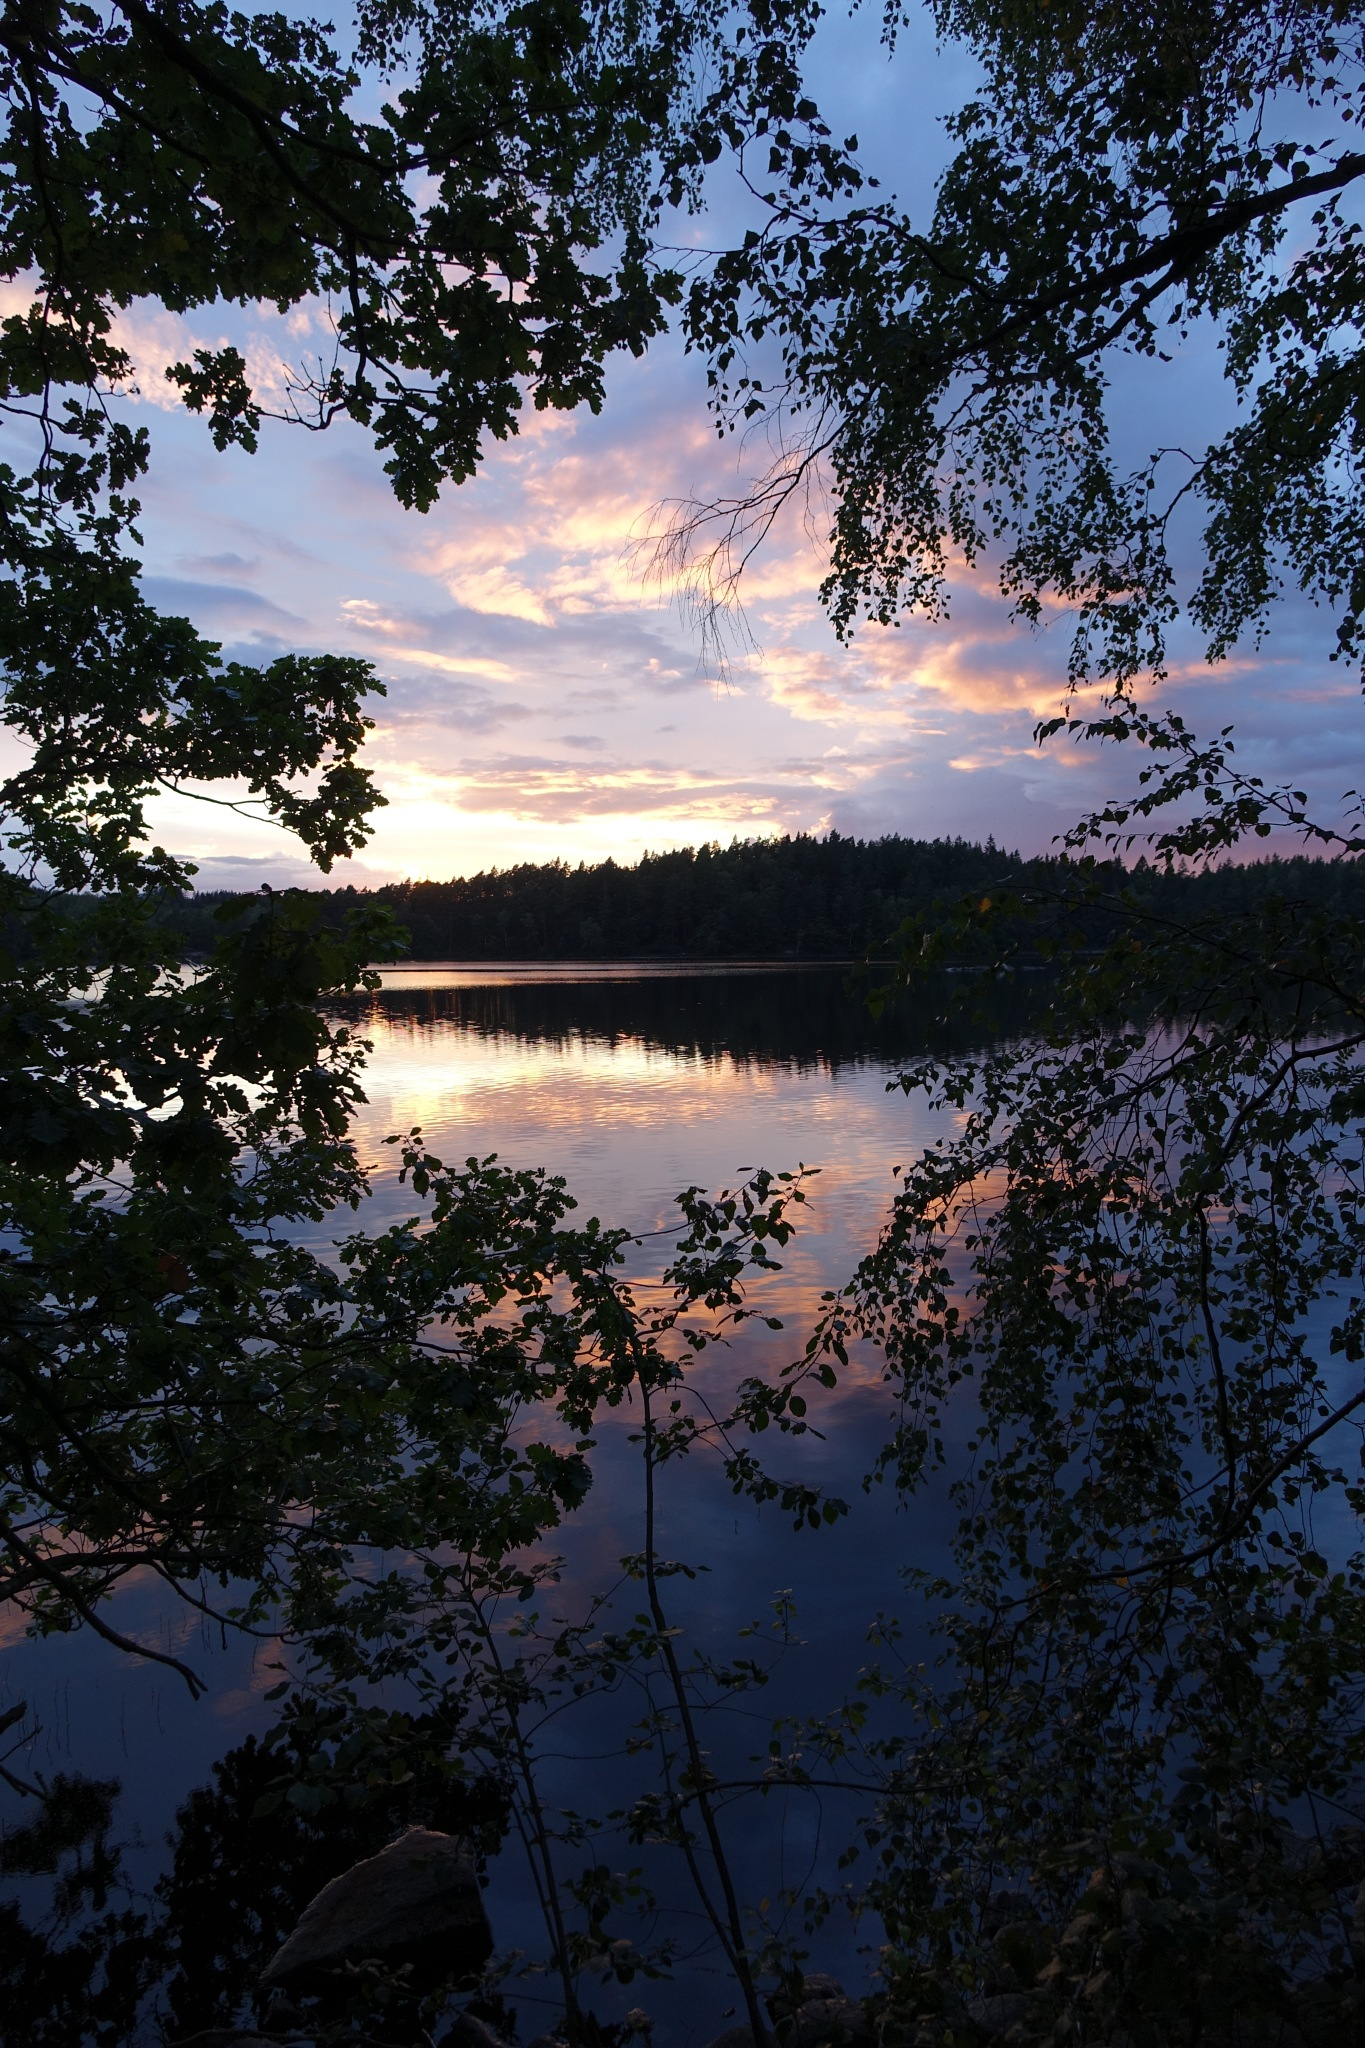 Septembernight at Raslången by peterliendeborg